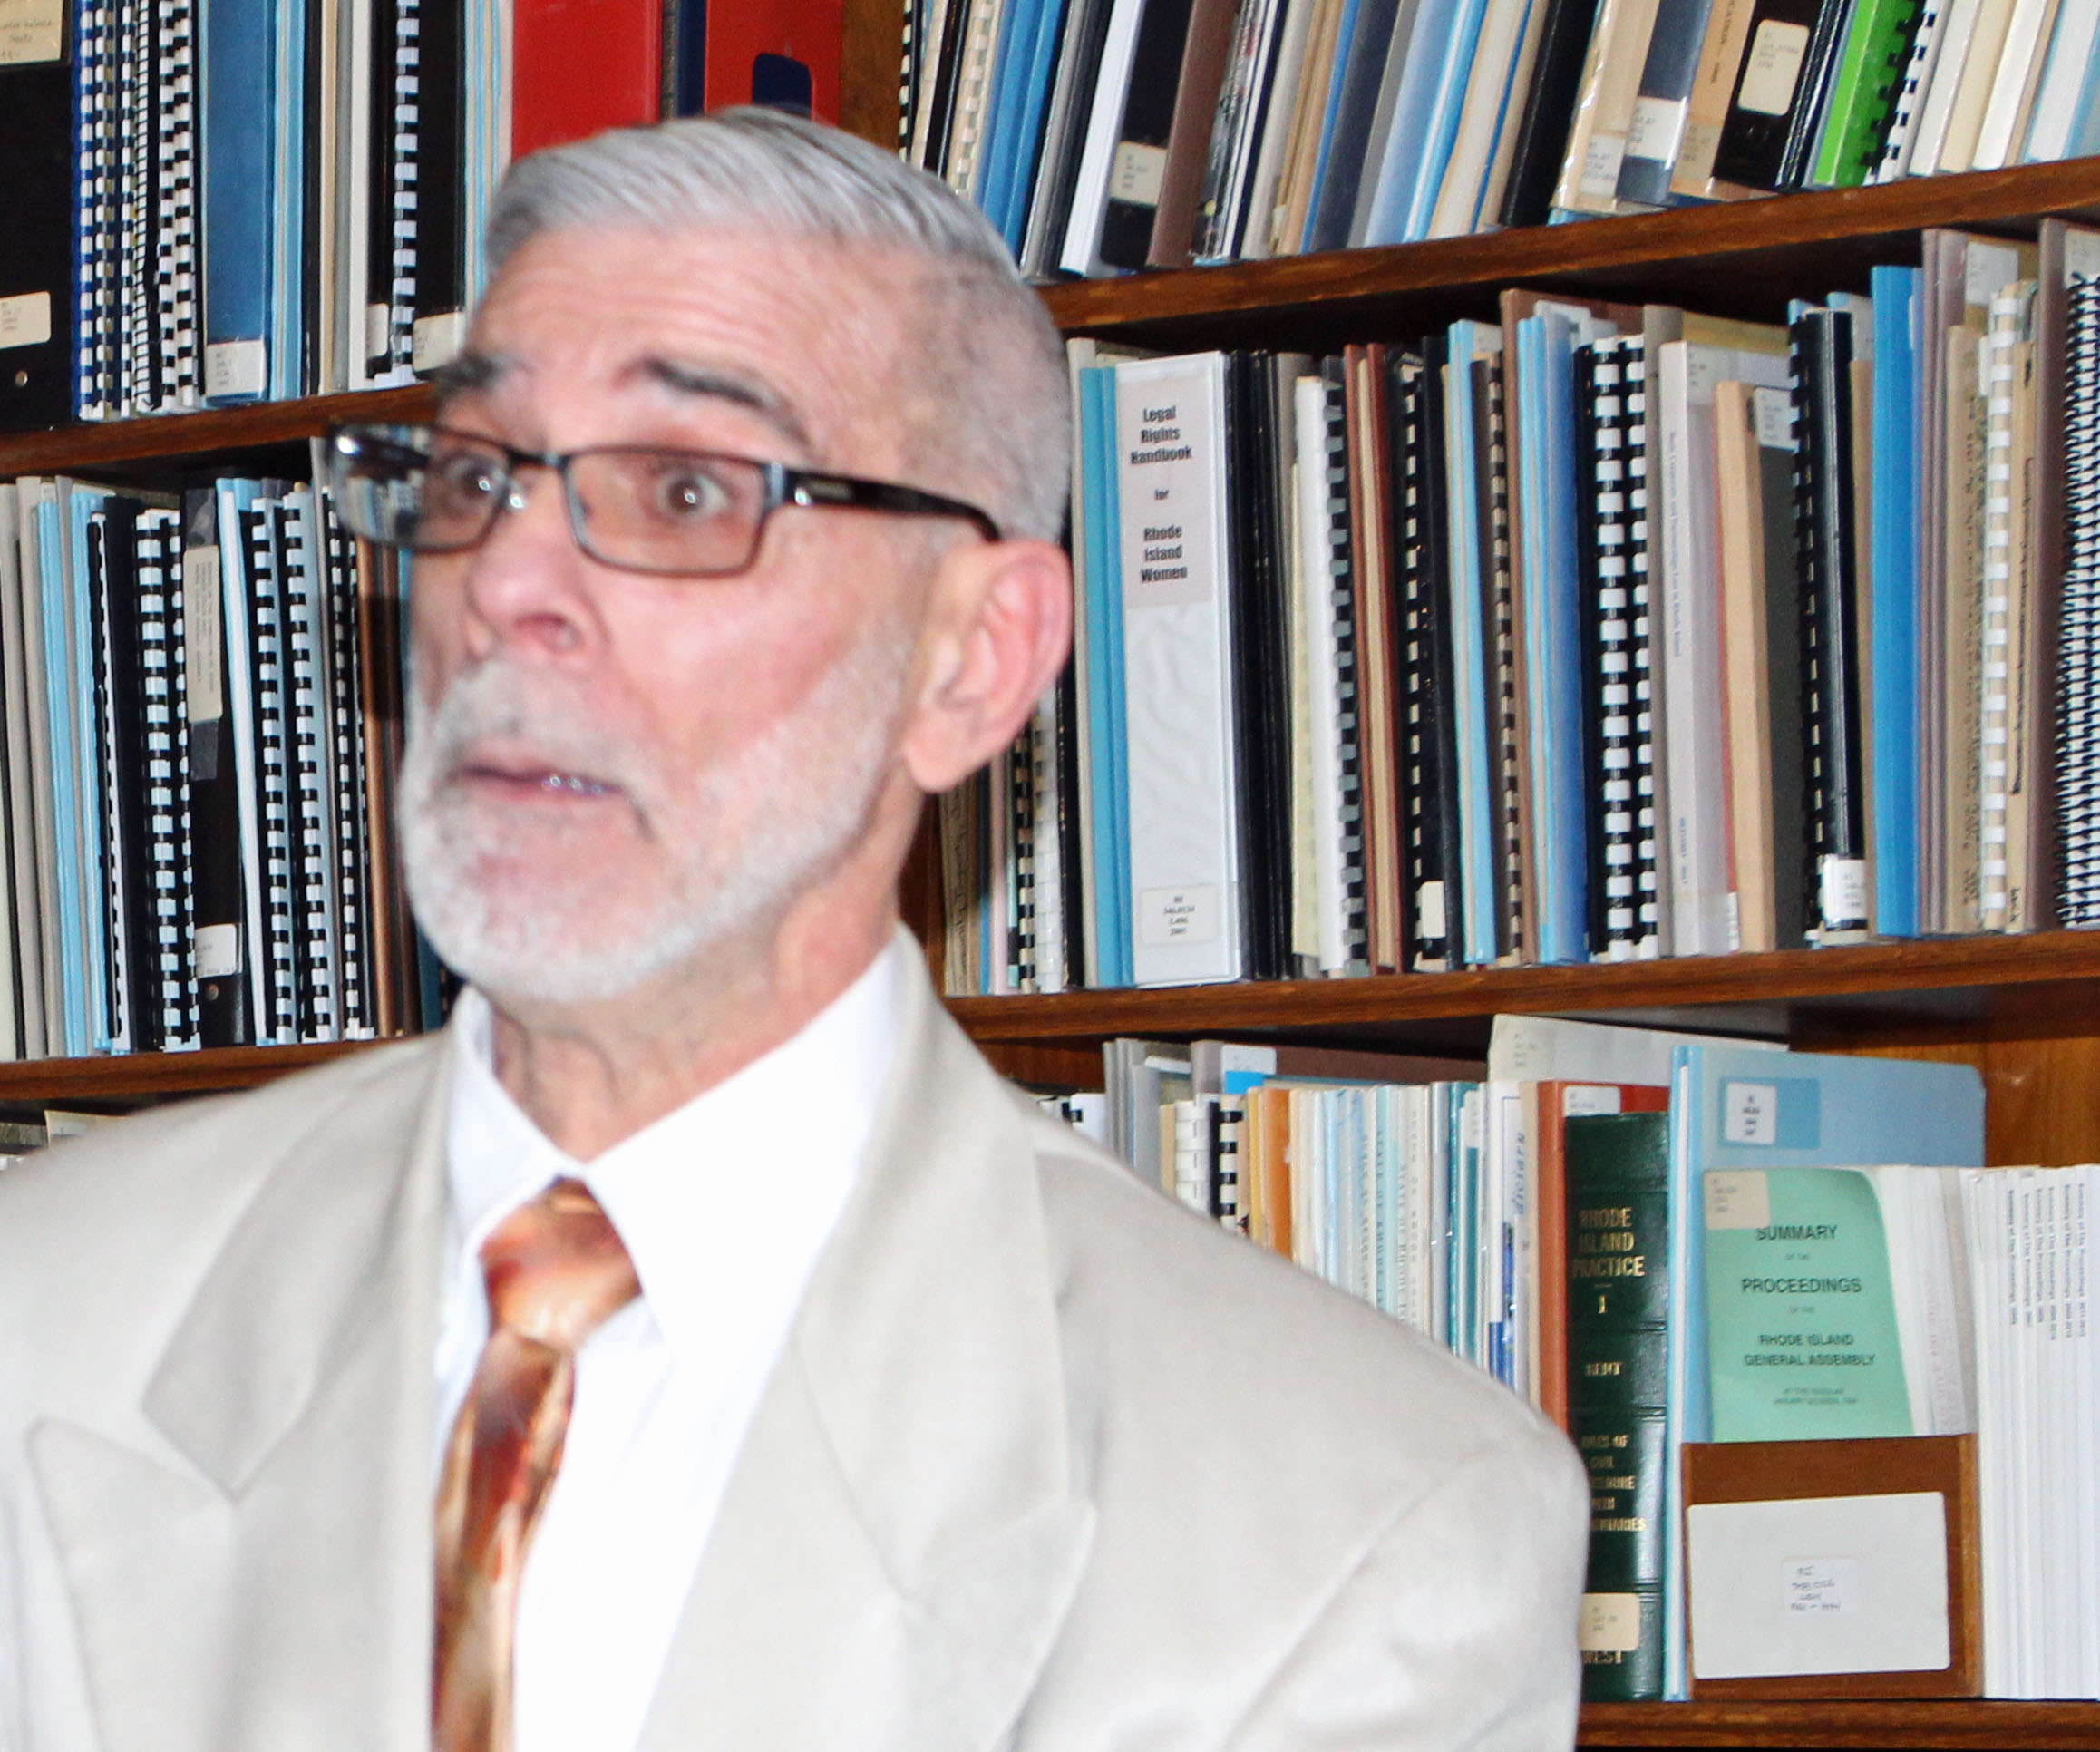 Joseph Ferreira